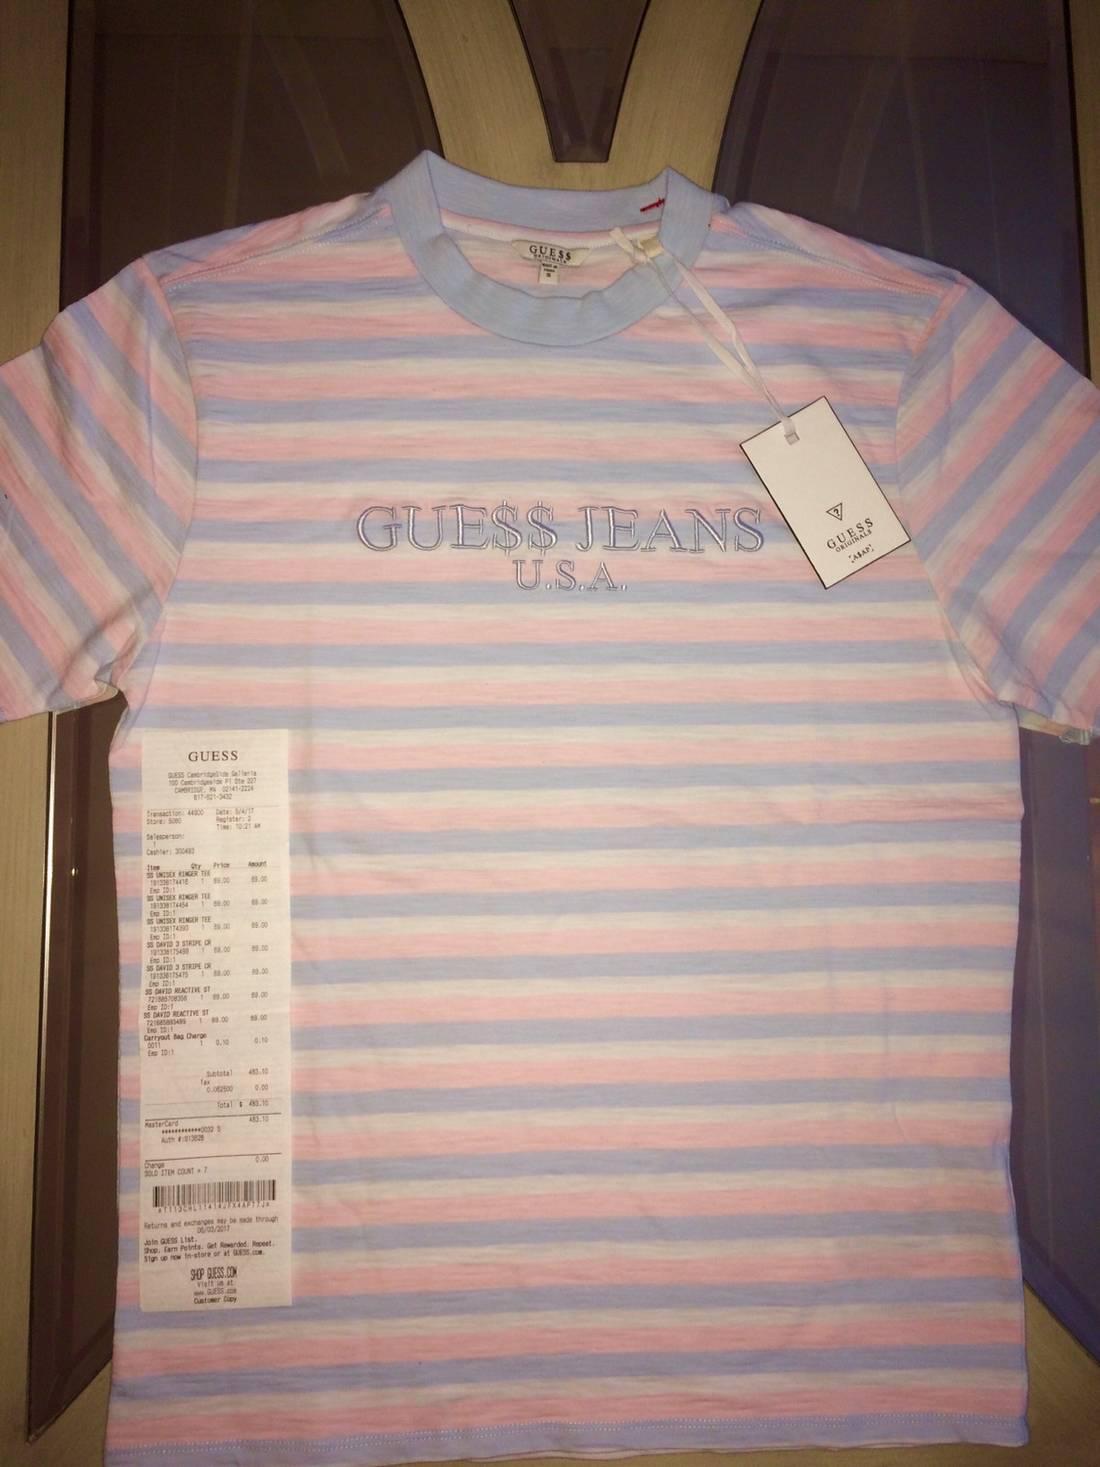 e4d31b843b83 Guess Jeans Usa 1981 Capsule Striped T Shirt Asap Vertical - raveitsafe